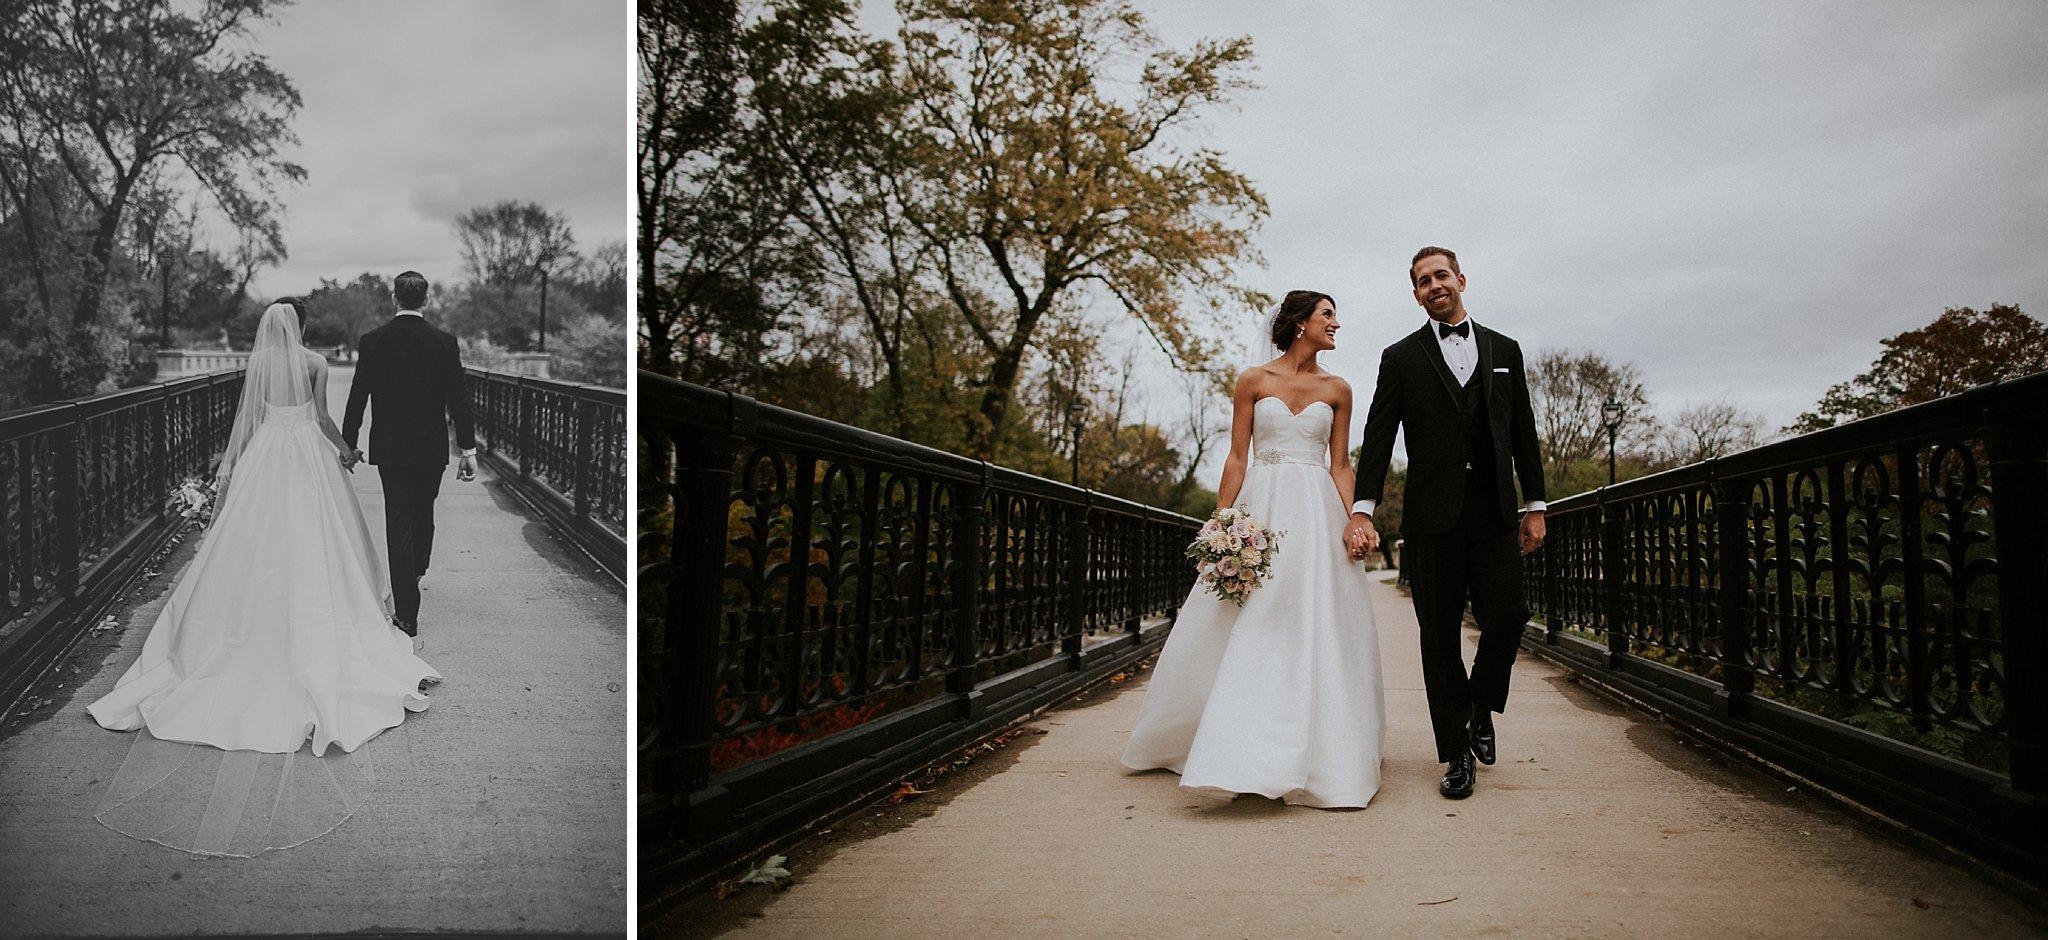 Matt-Lauren_St-Marys_Hilton-City-Center-Milwaukee-Wedding_liller-photo_0038.jpg